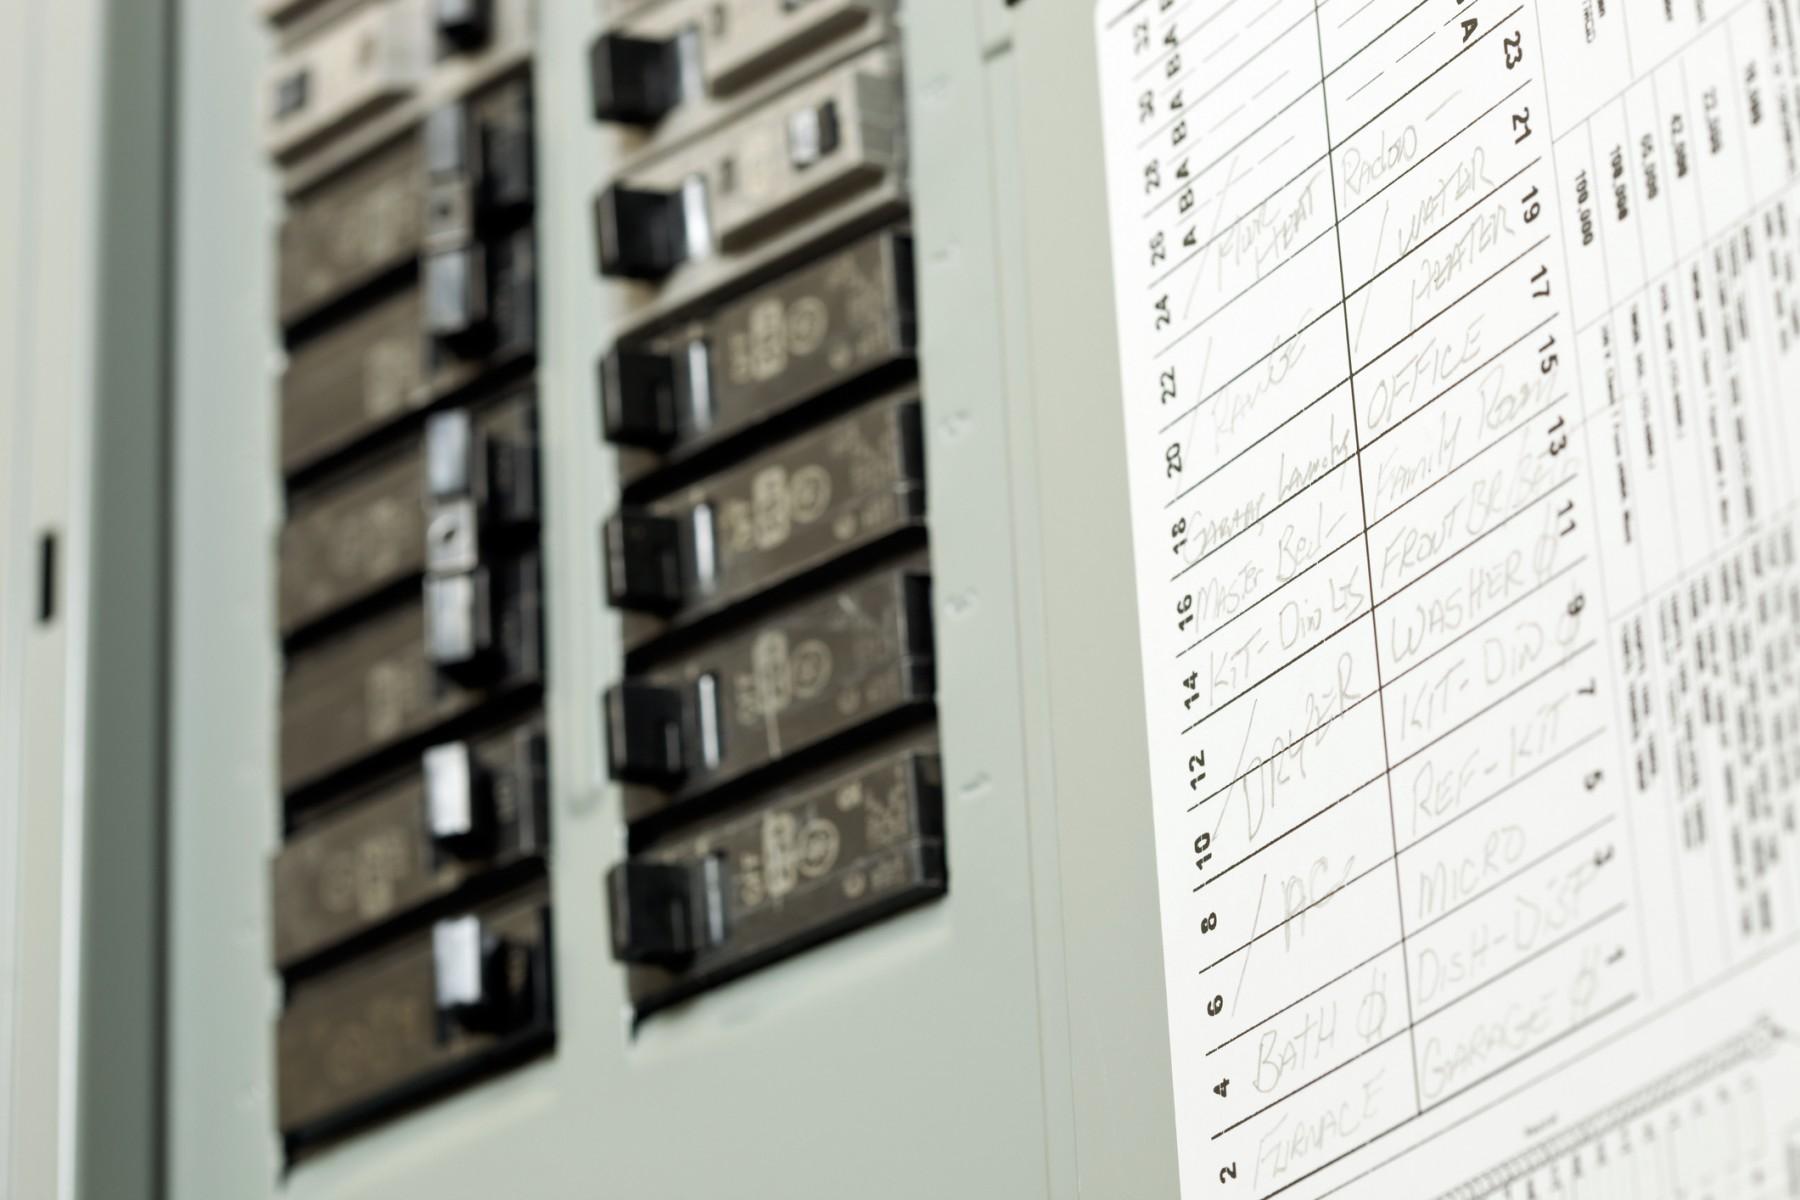 electrical service panel - Tim Kyle